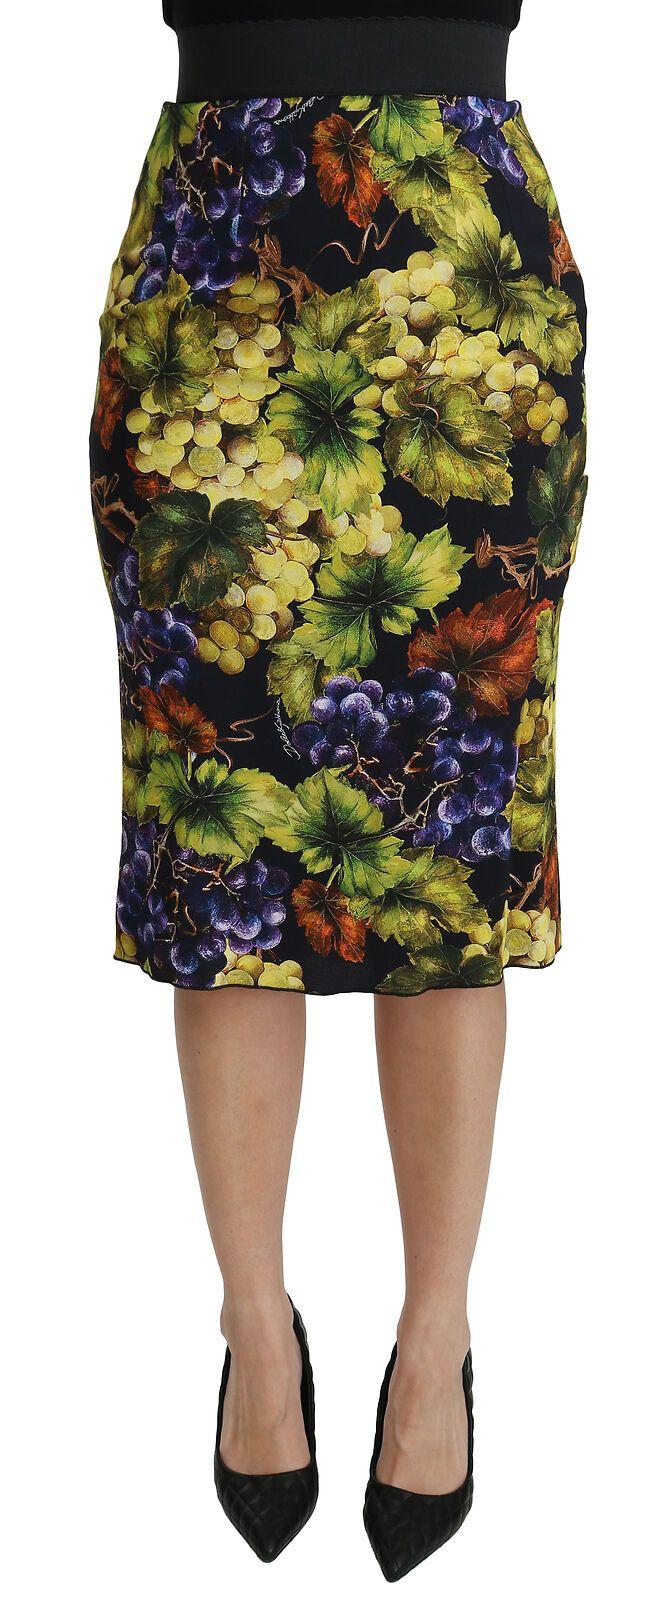 Dolce & Gabbana Women's Grapes Stretch Midi Skirt Multicolor SKI1375 - IT36 | XS